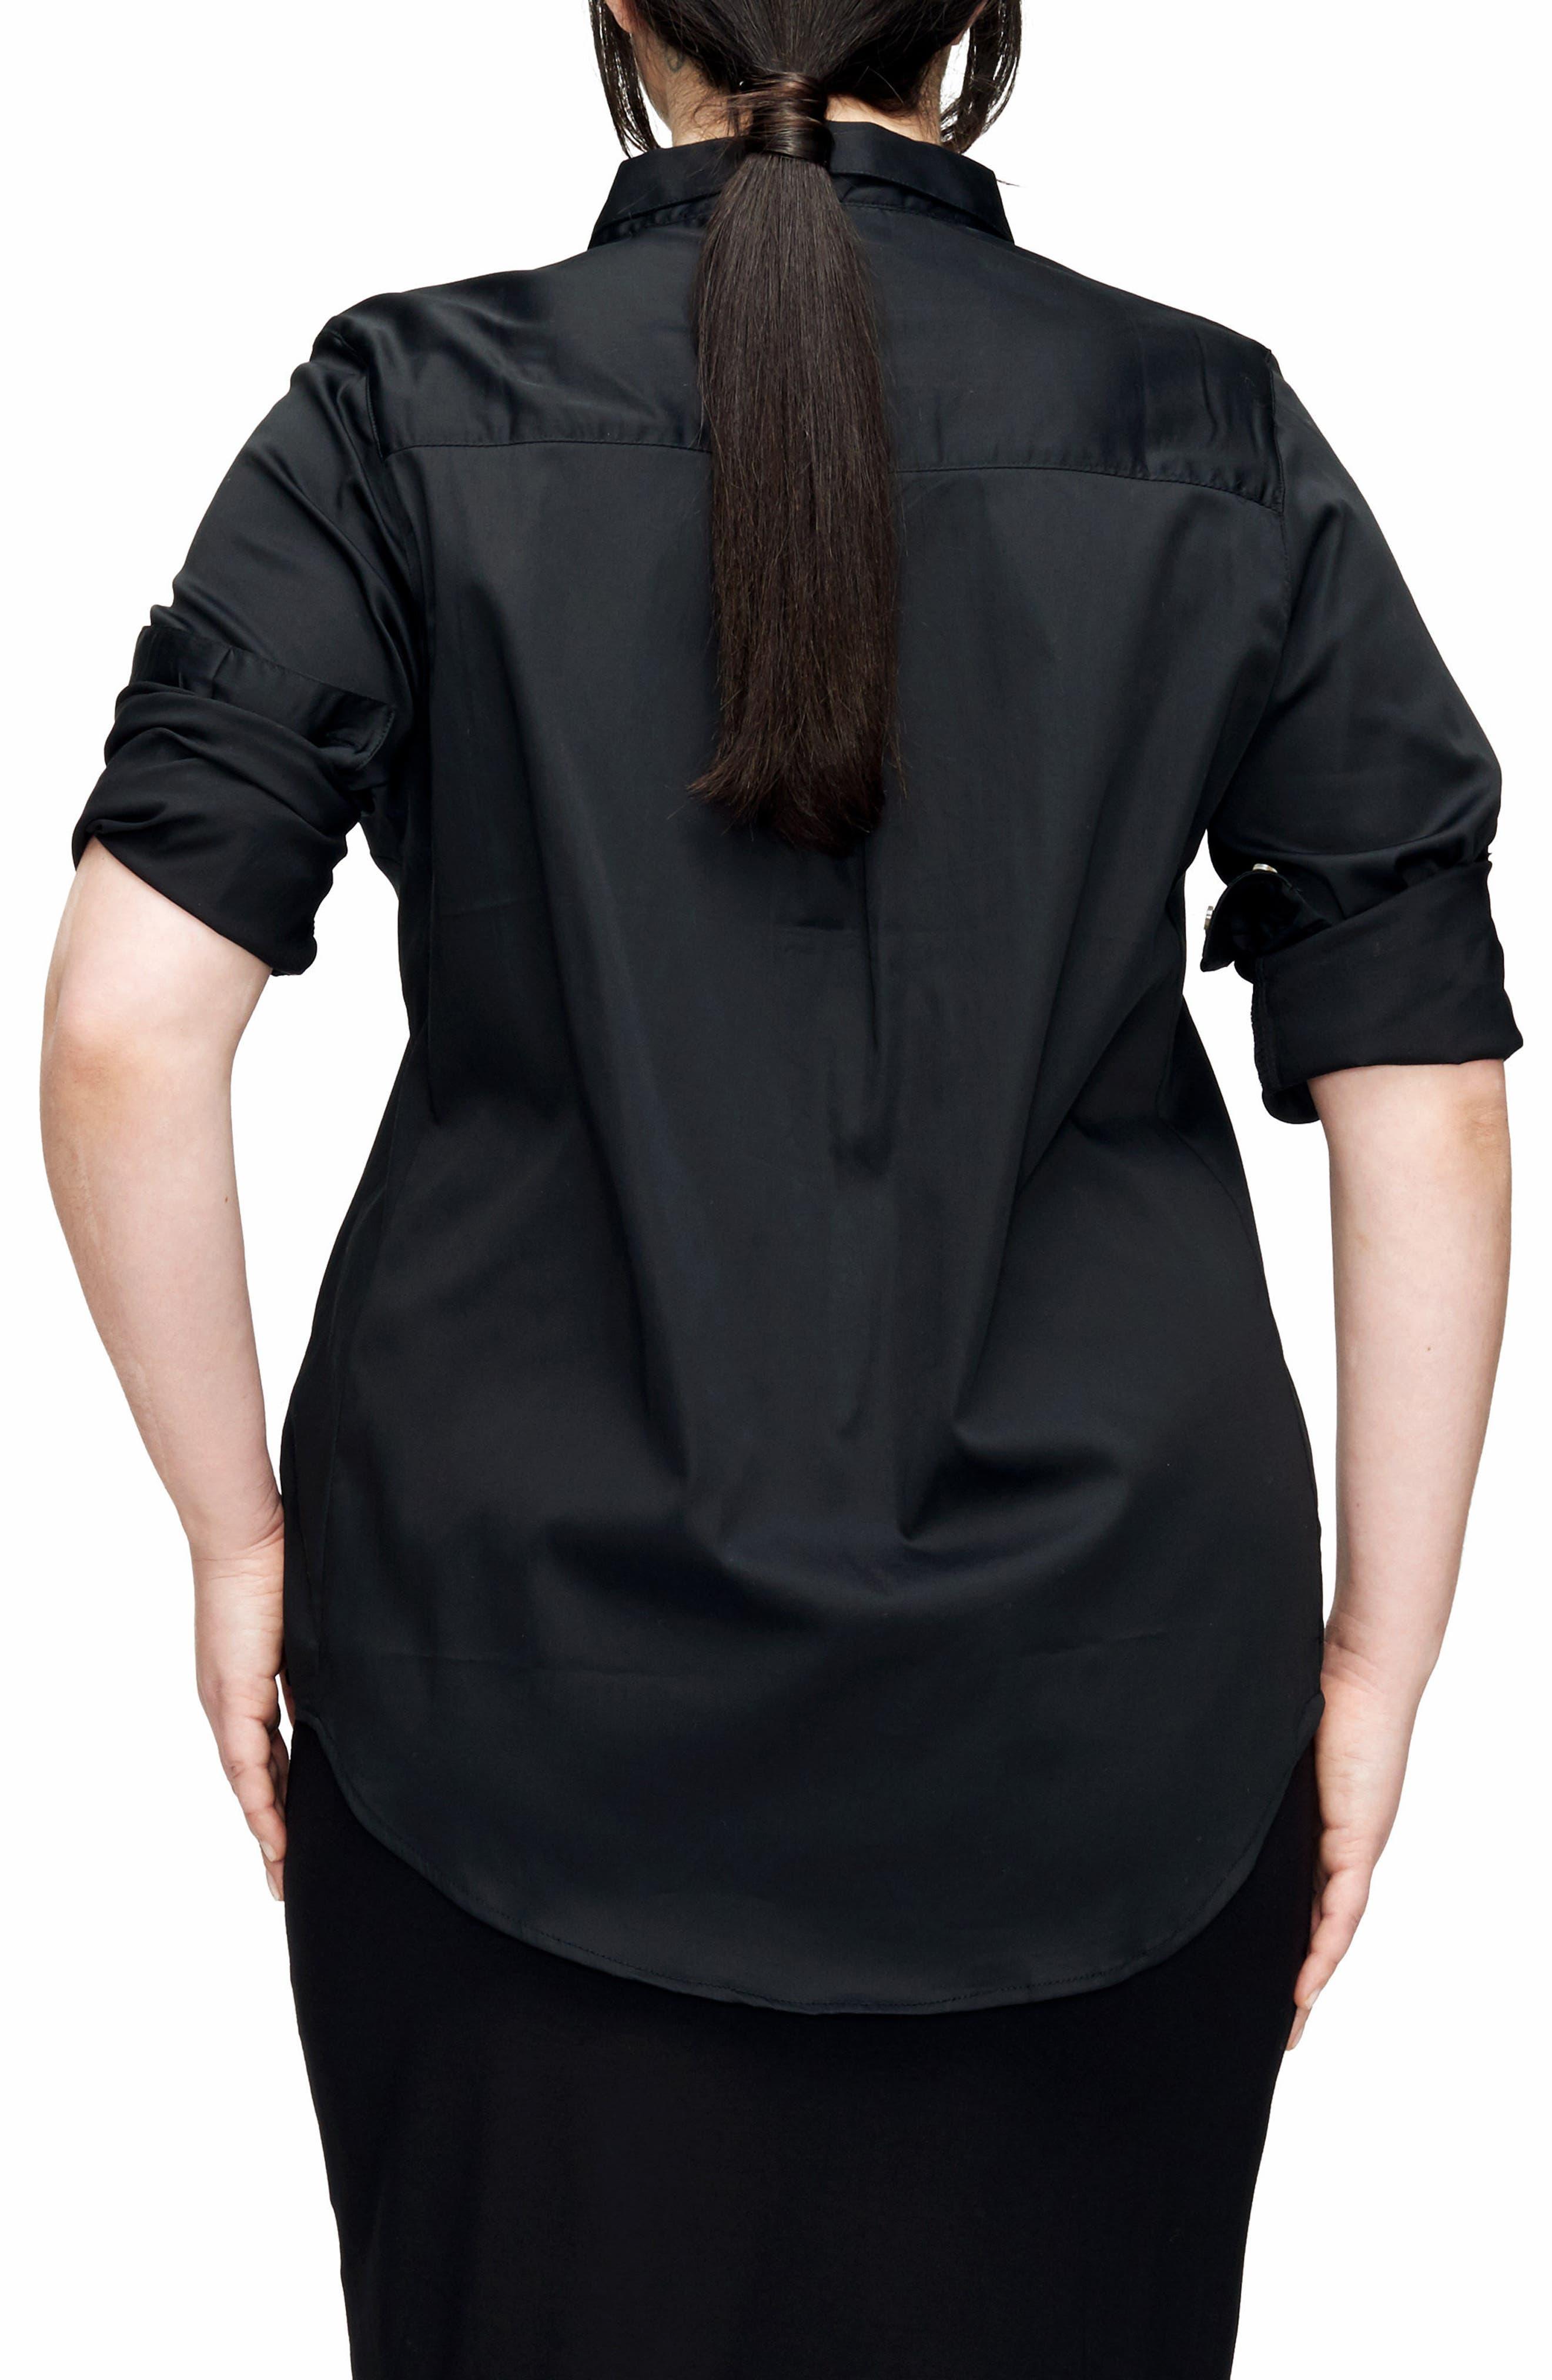 Elbe Shirt,                             Alternate thumbnail 2, color,                             001